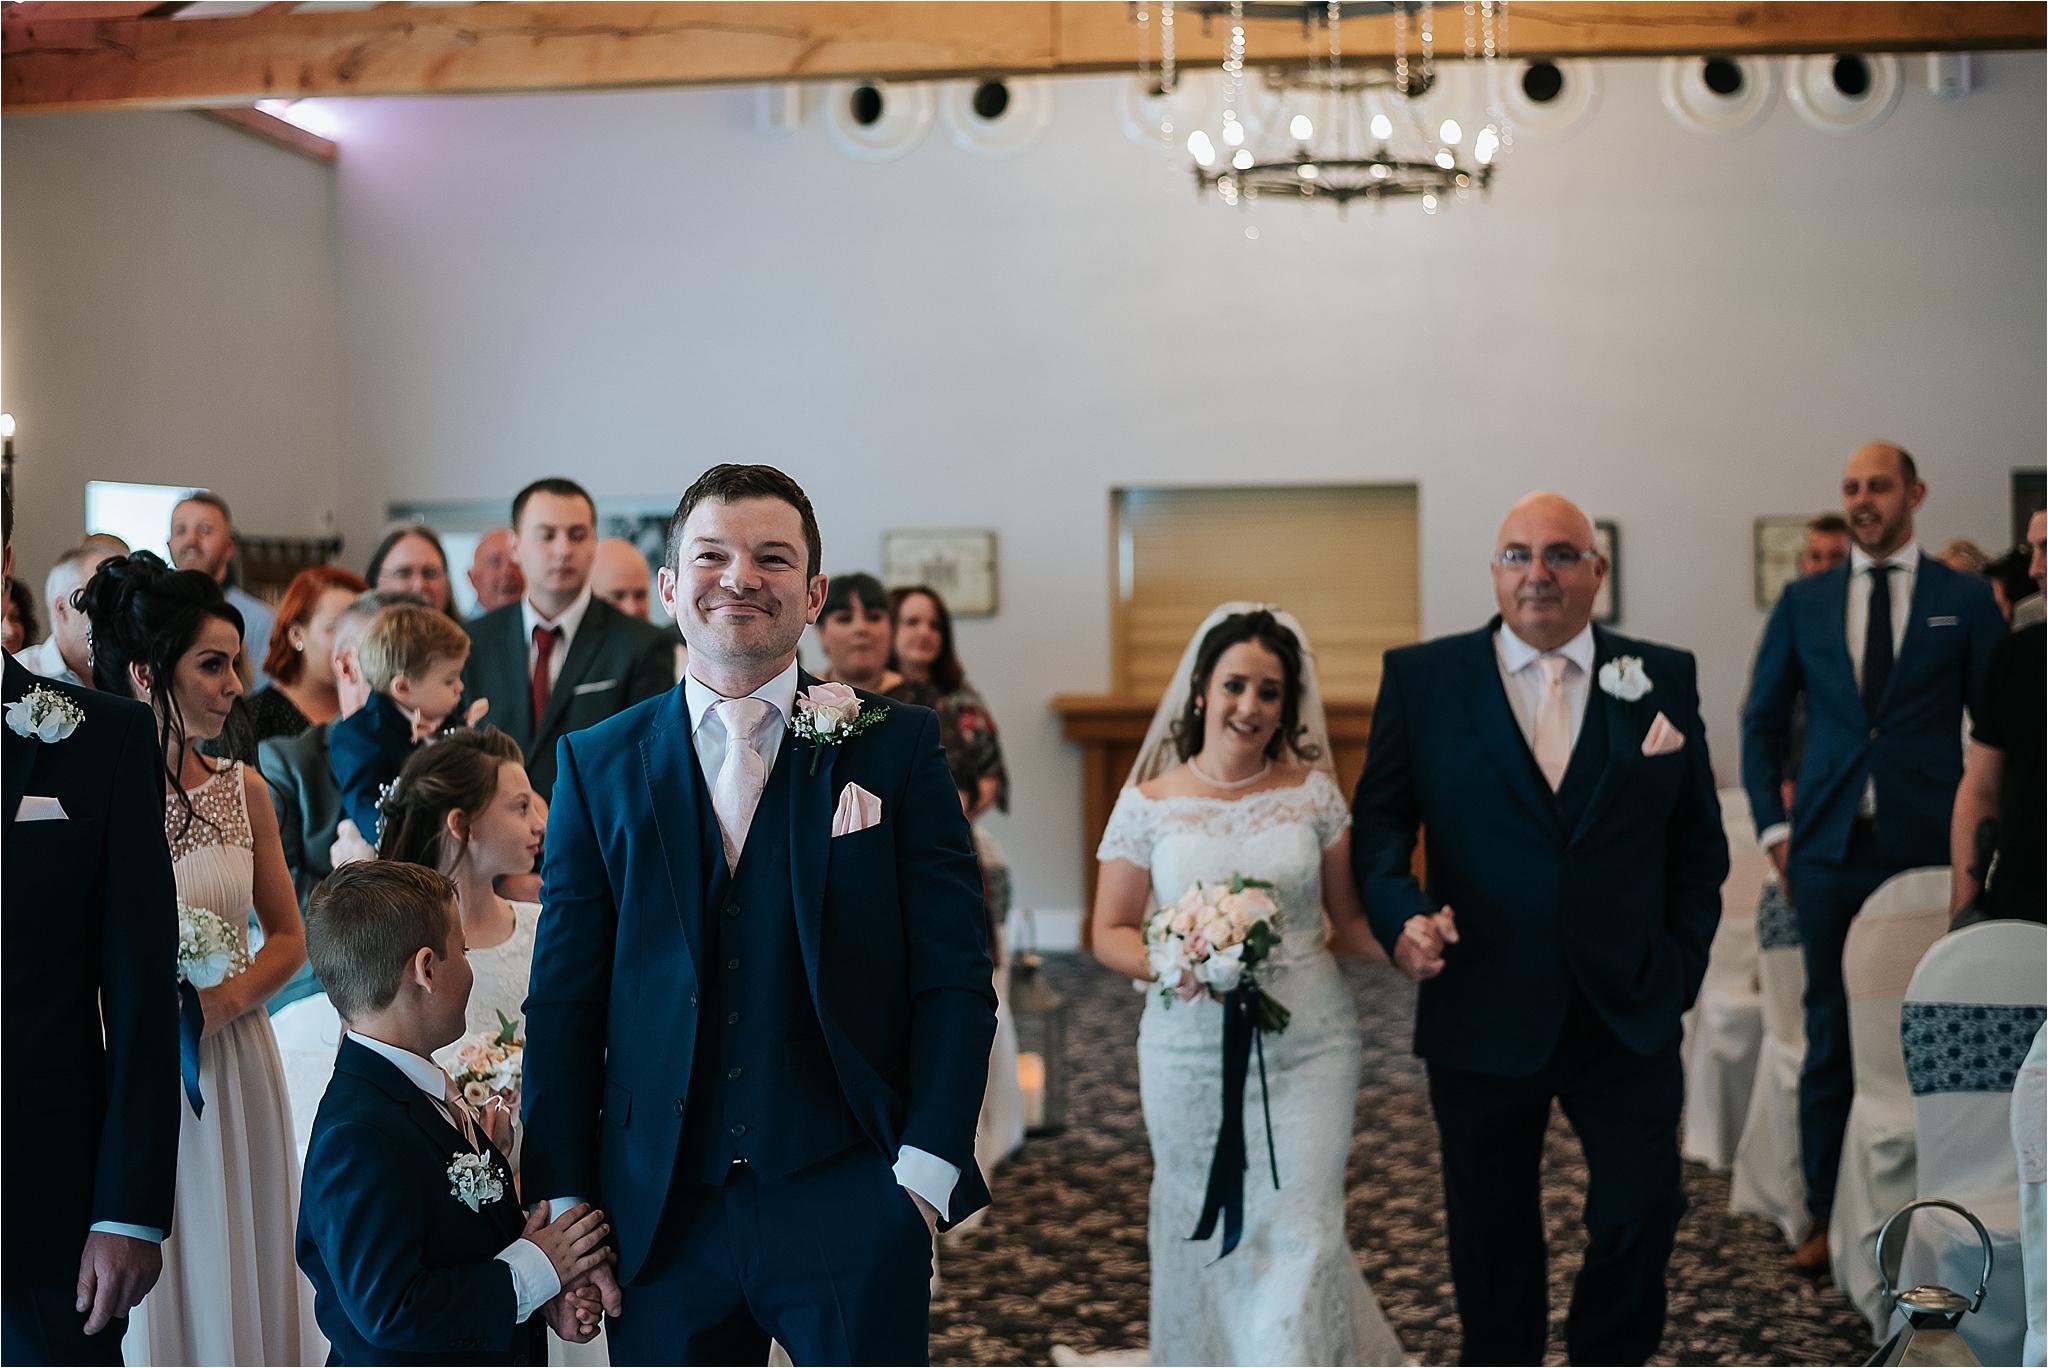 thevilla+lancashire+wreagreen+wedding+photographer21.jpg